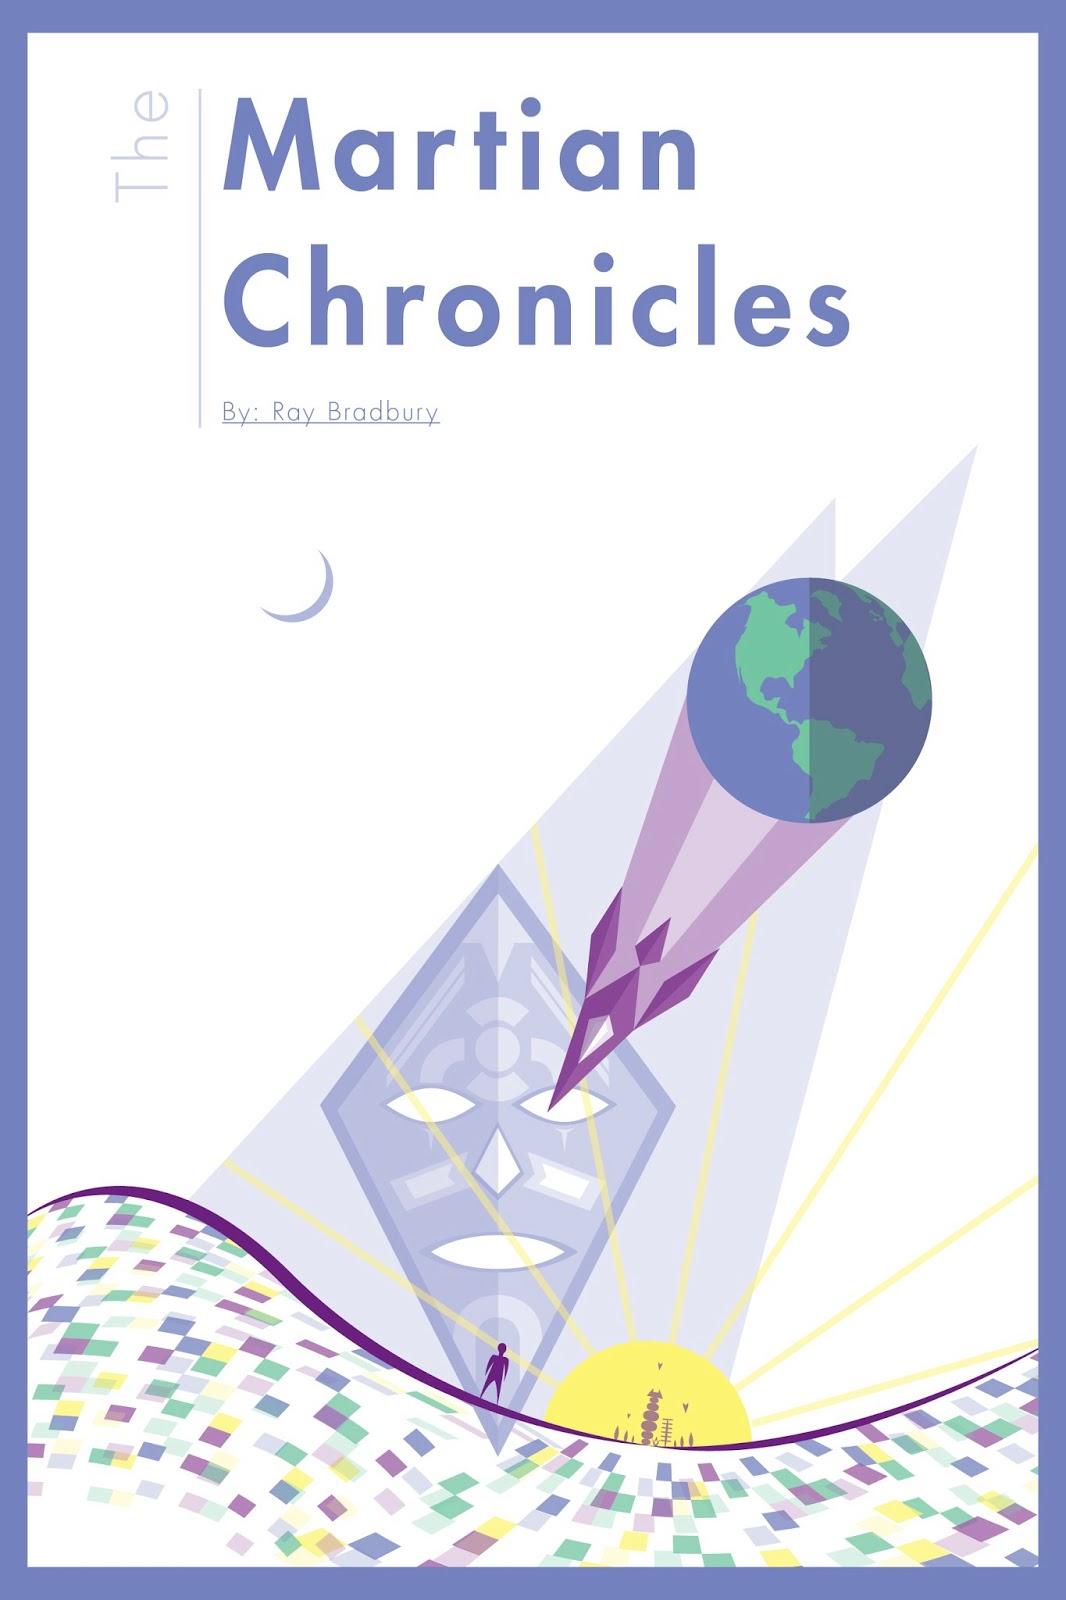 ray bradbury martian chronicles pdf